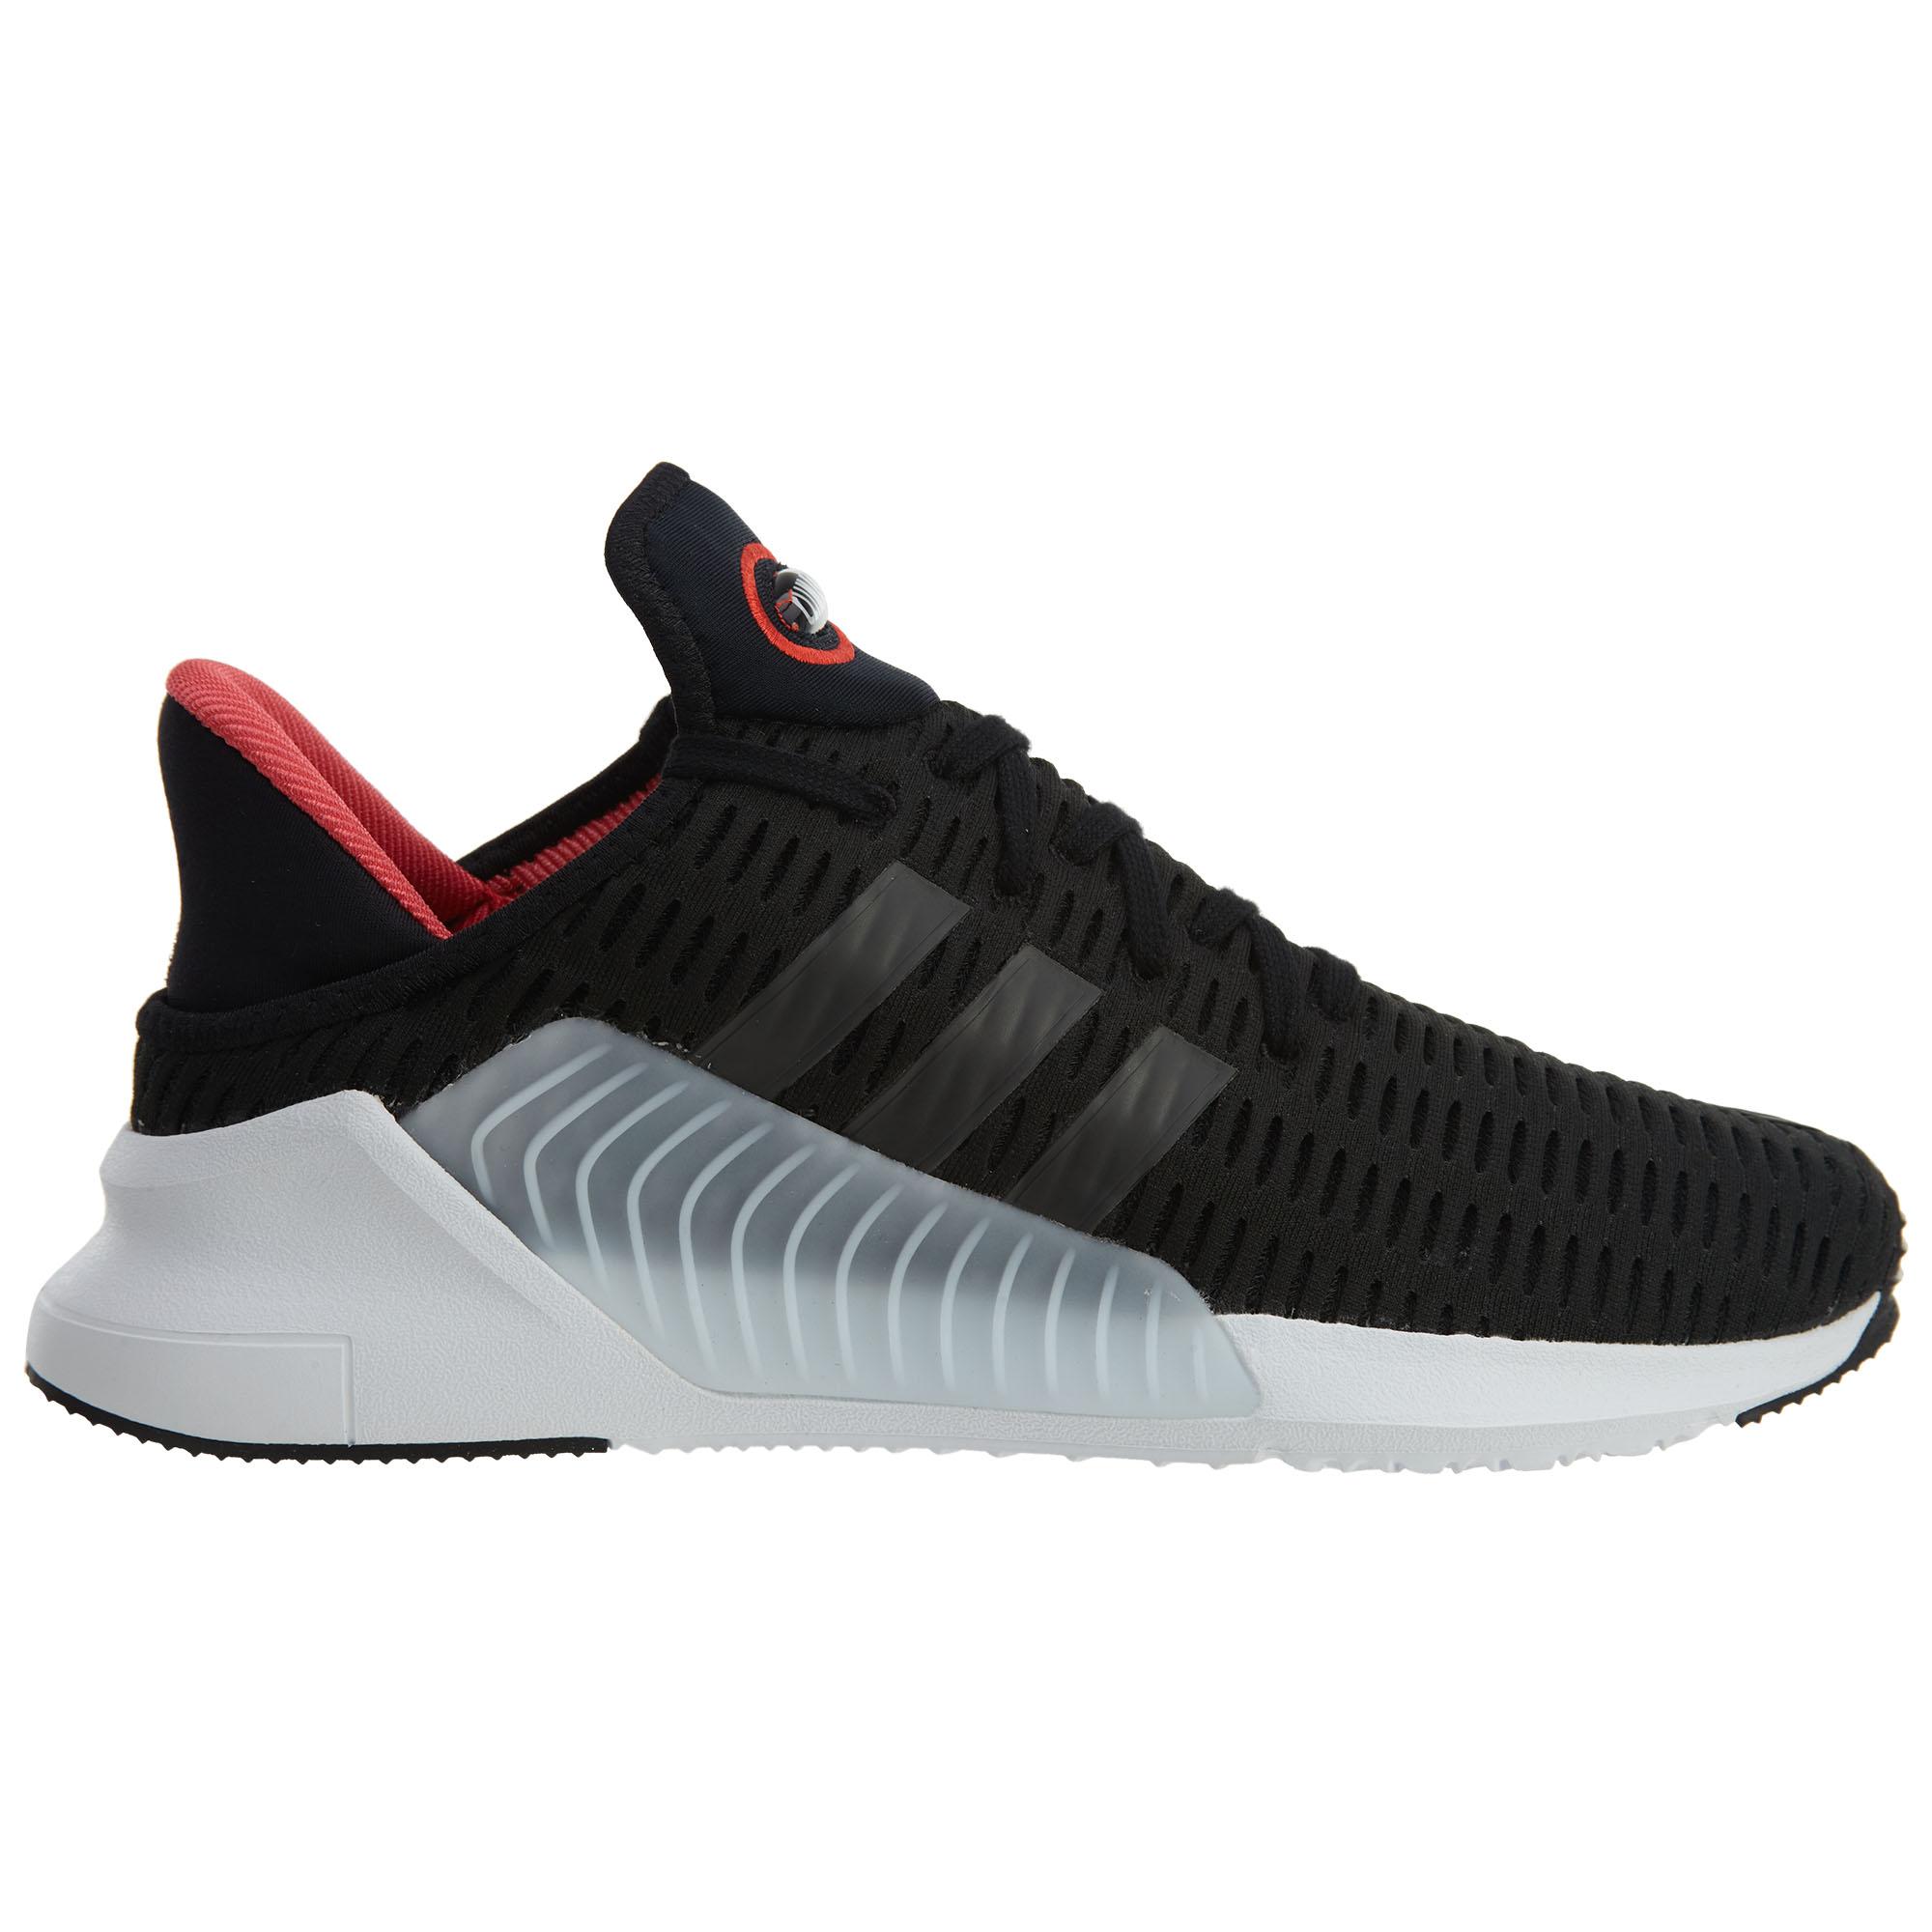 adidas Climacool 02/17 Black/Black/White